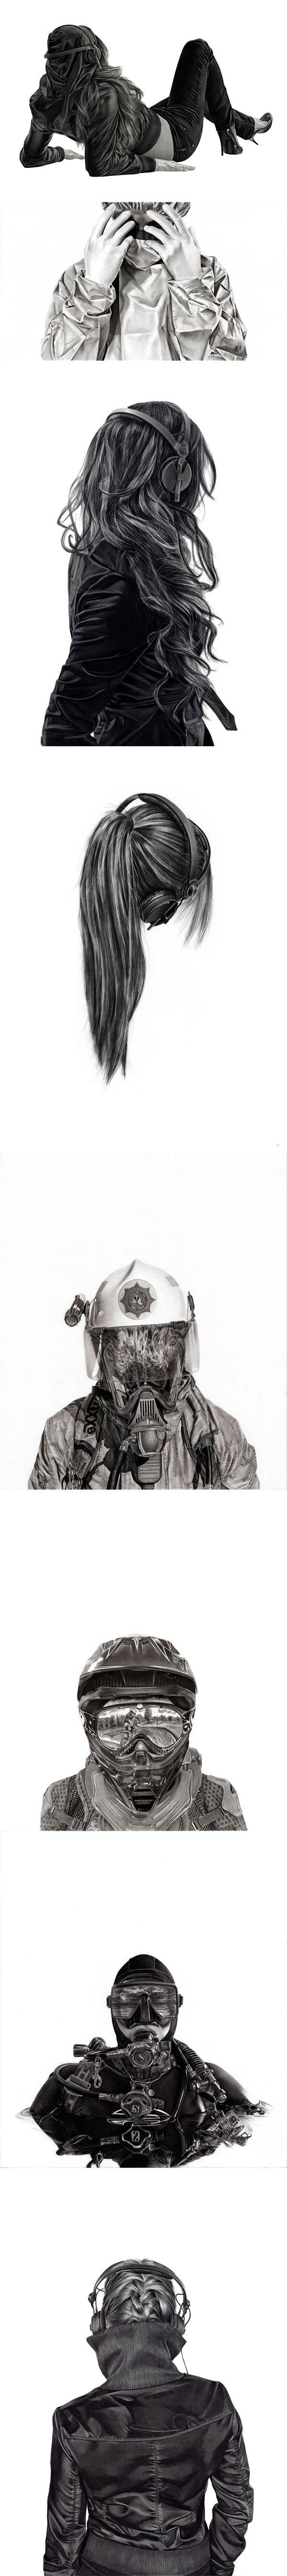 Yanni Floros | Artskills